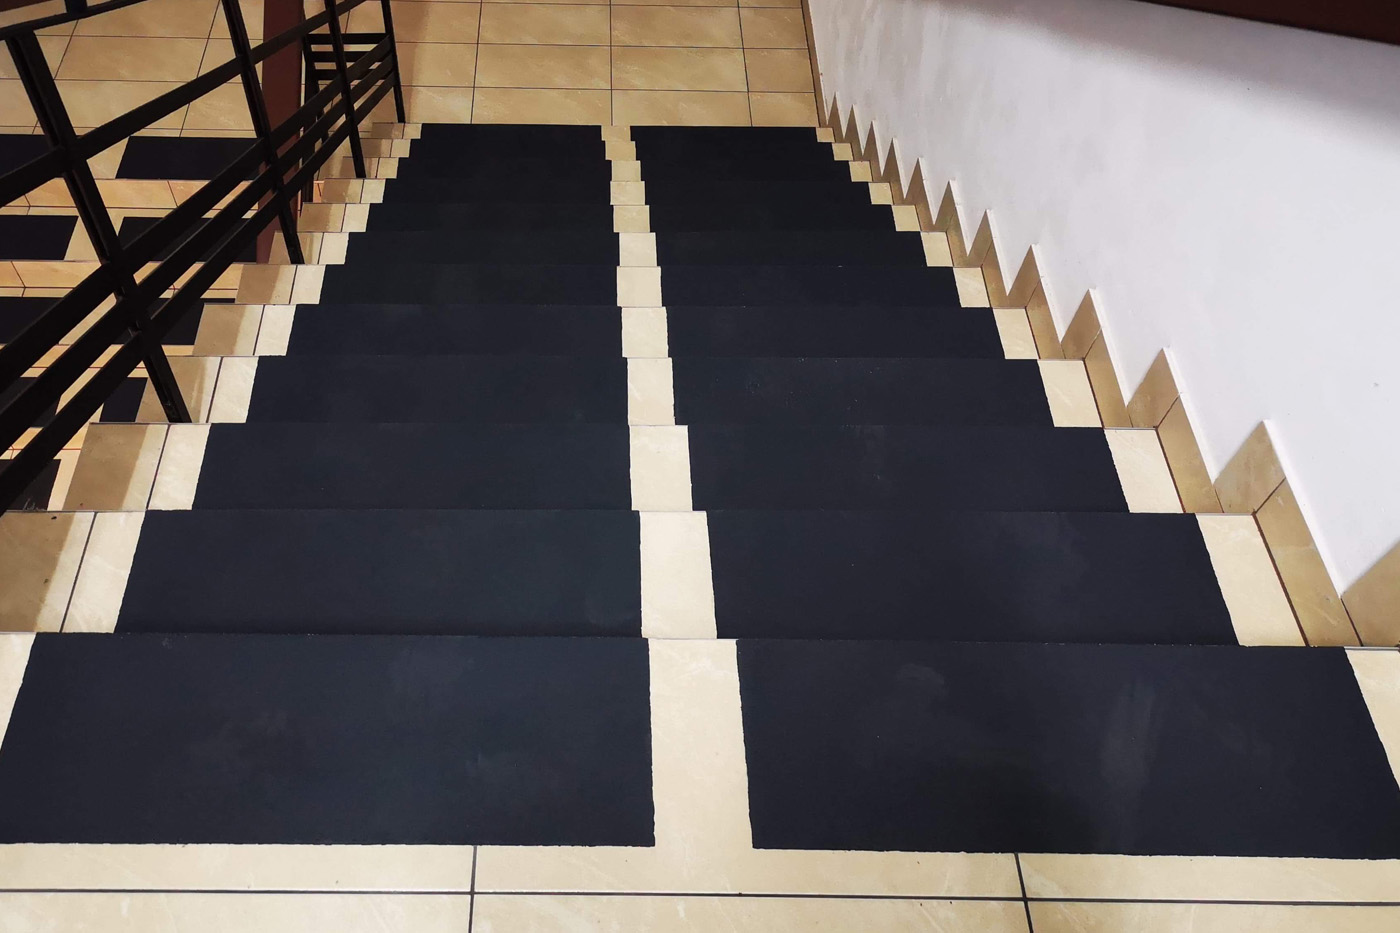 Pasy antypoślizgowe na schody INNOVARE